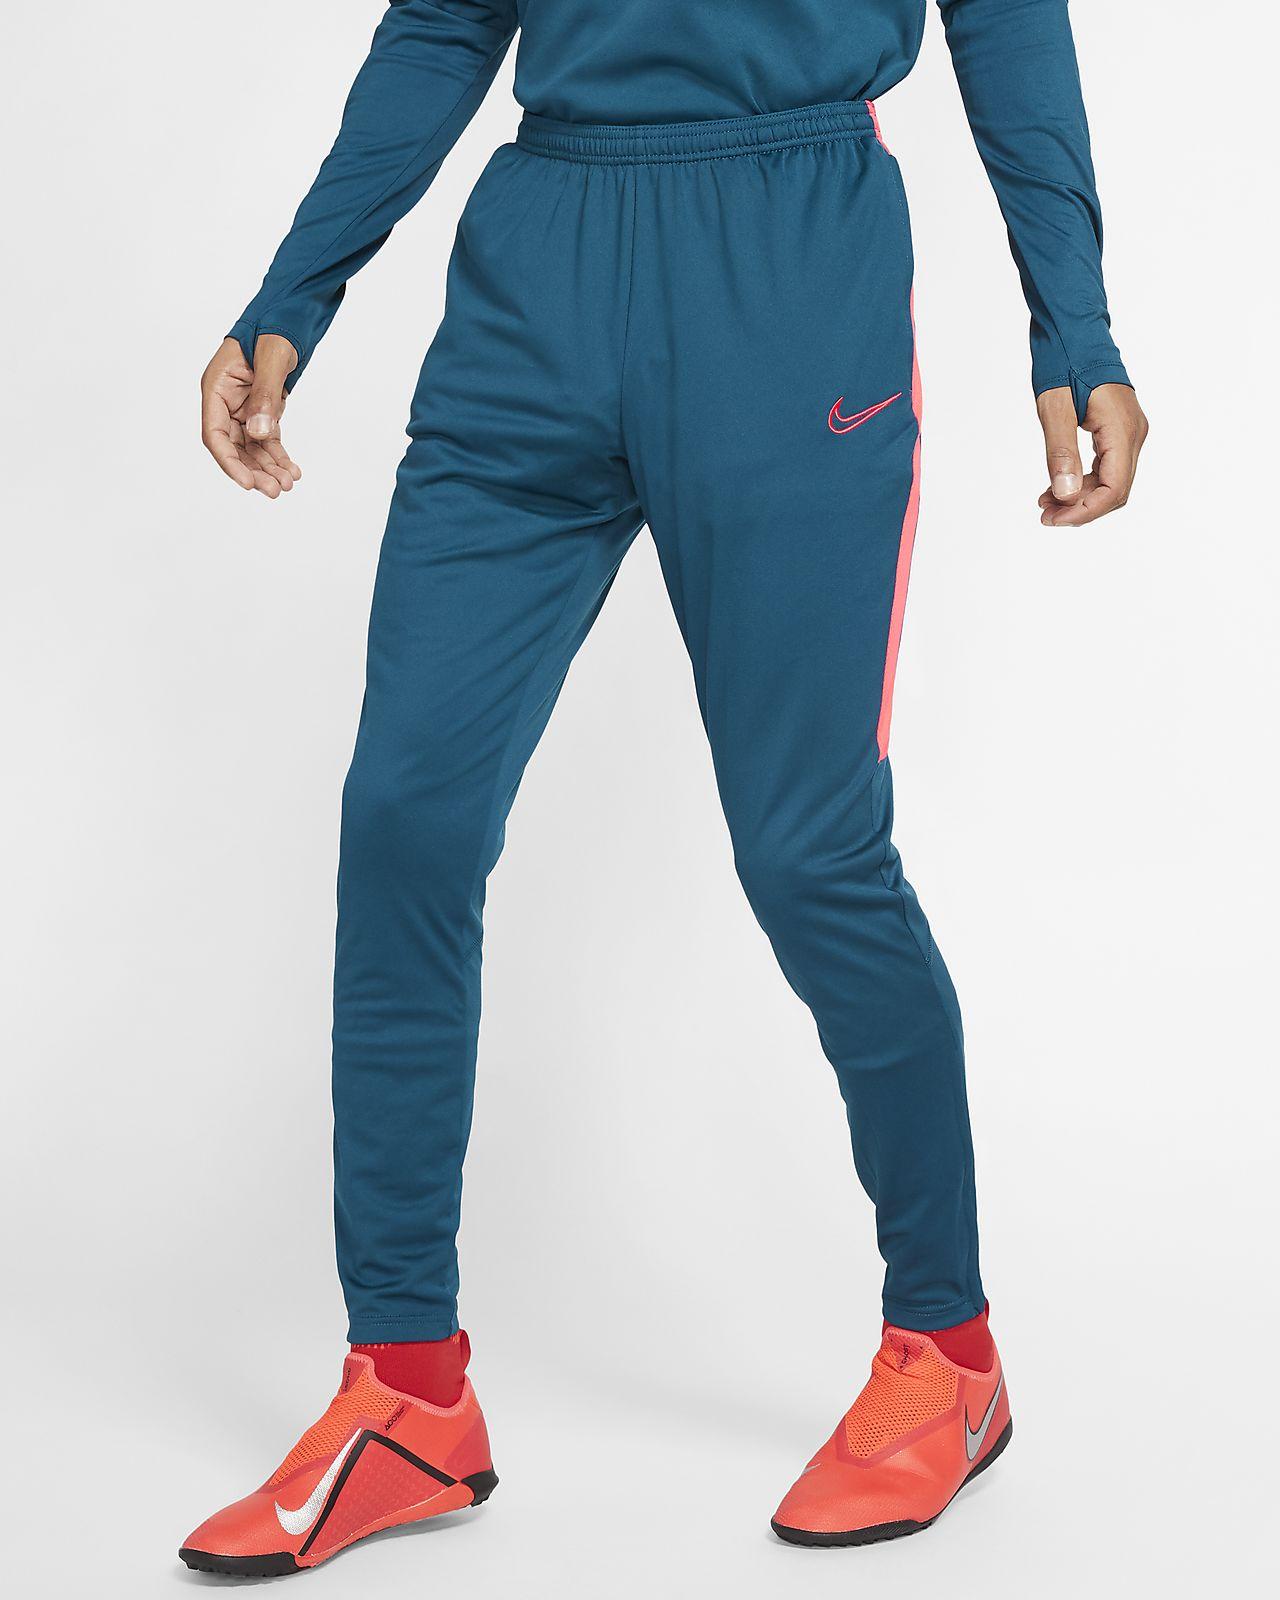 Bluza męska Dri FIT Strike Nike (valerian blue) sklep